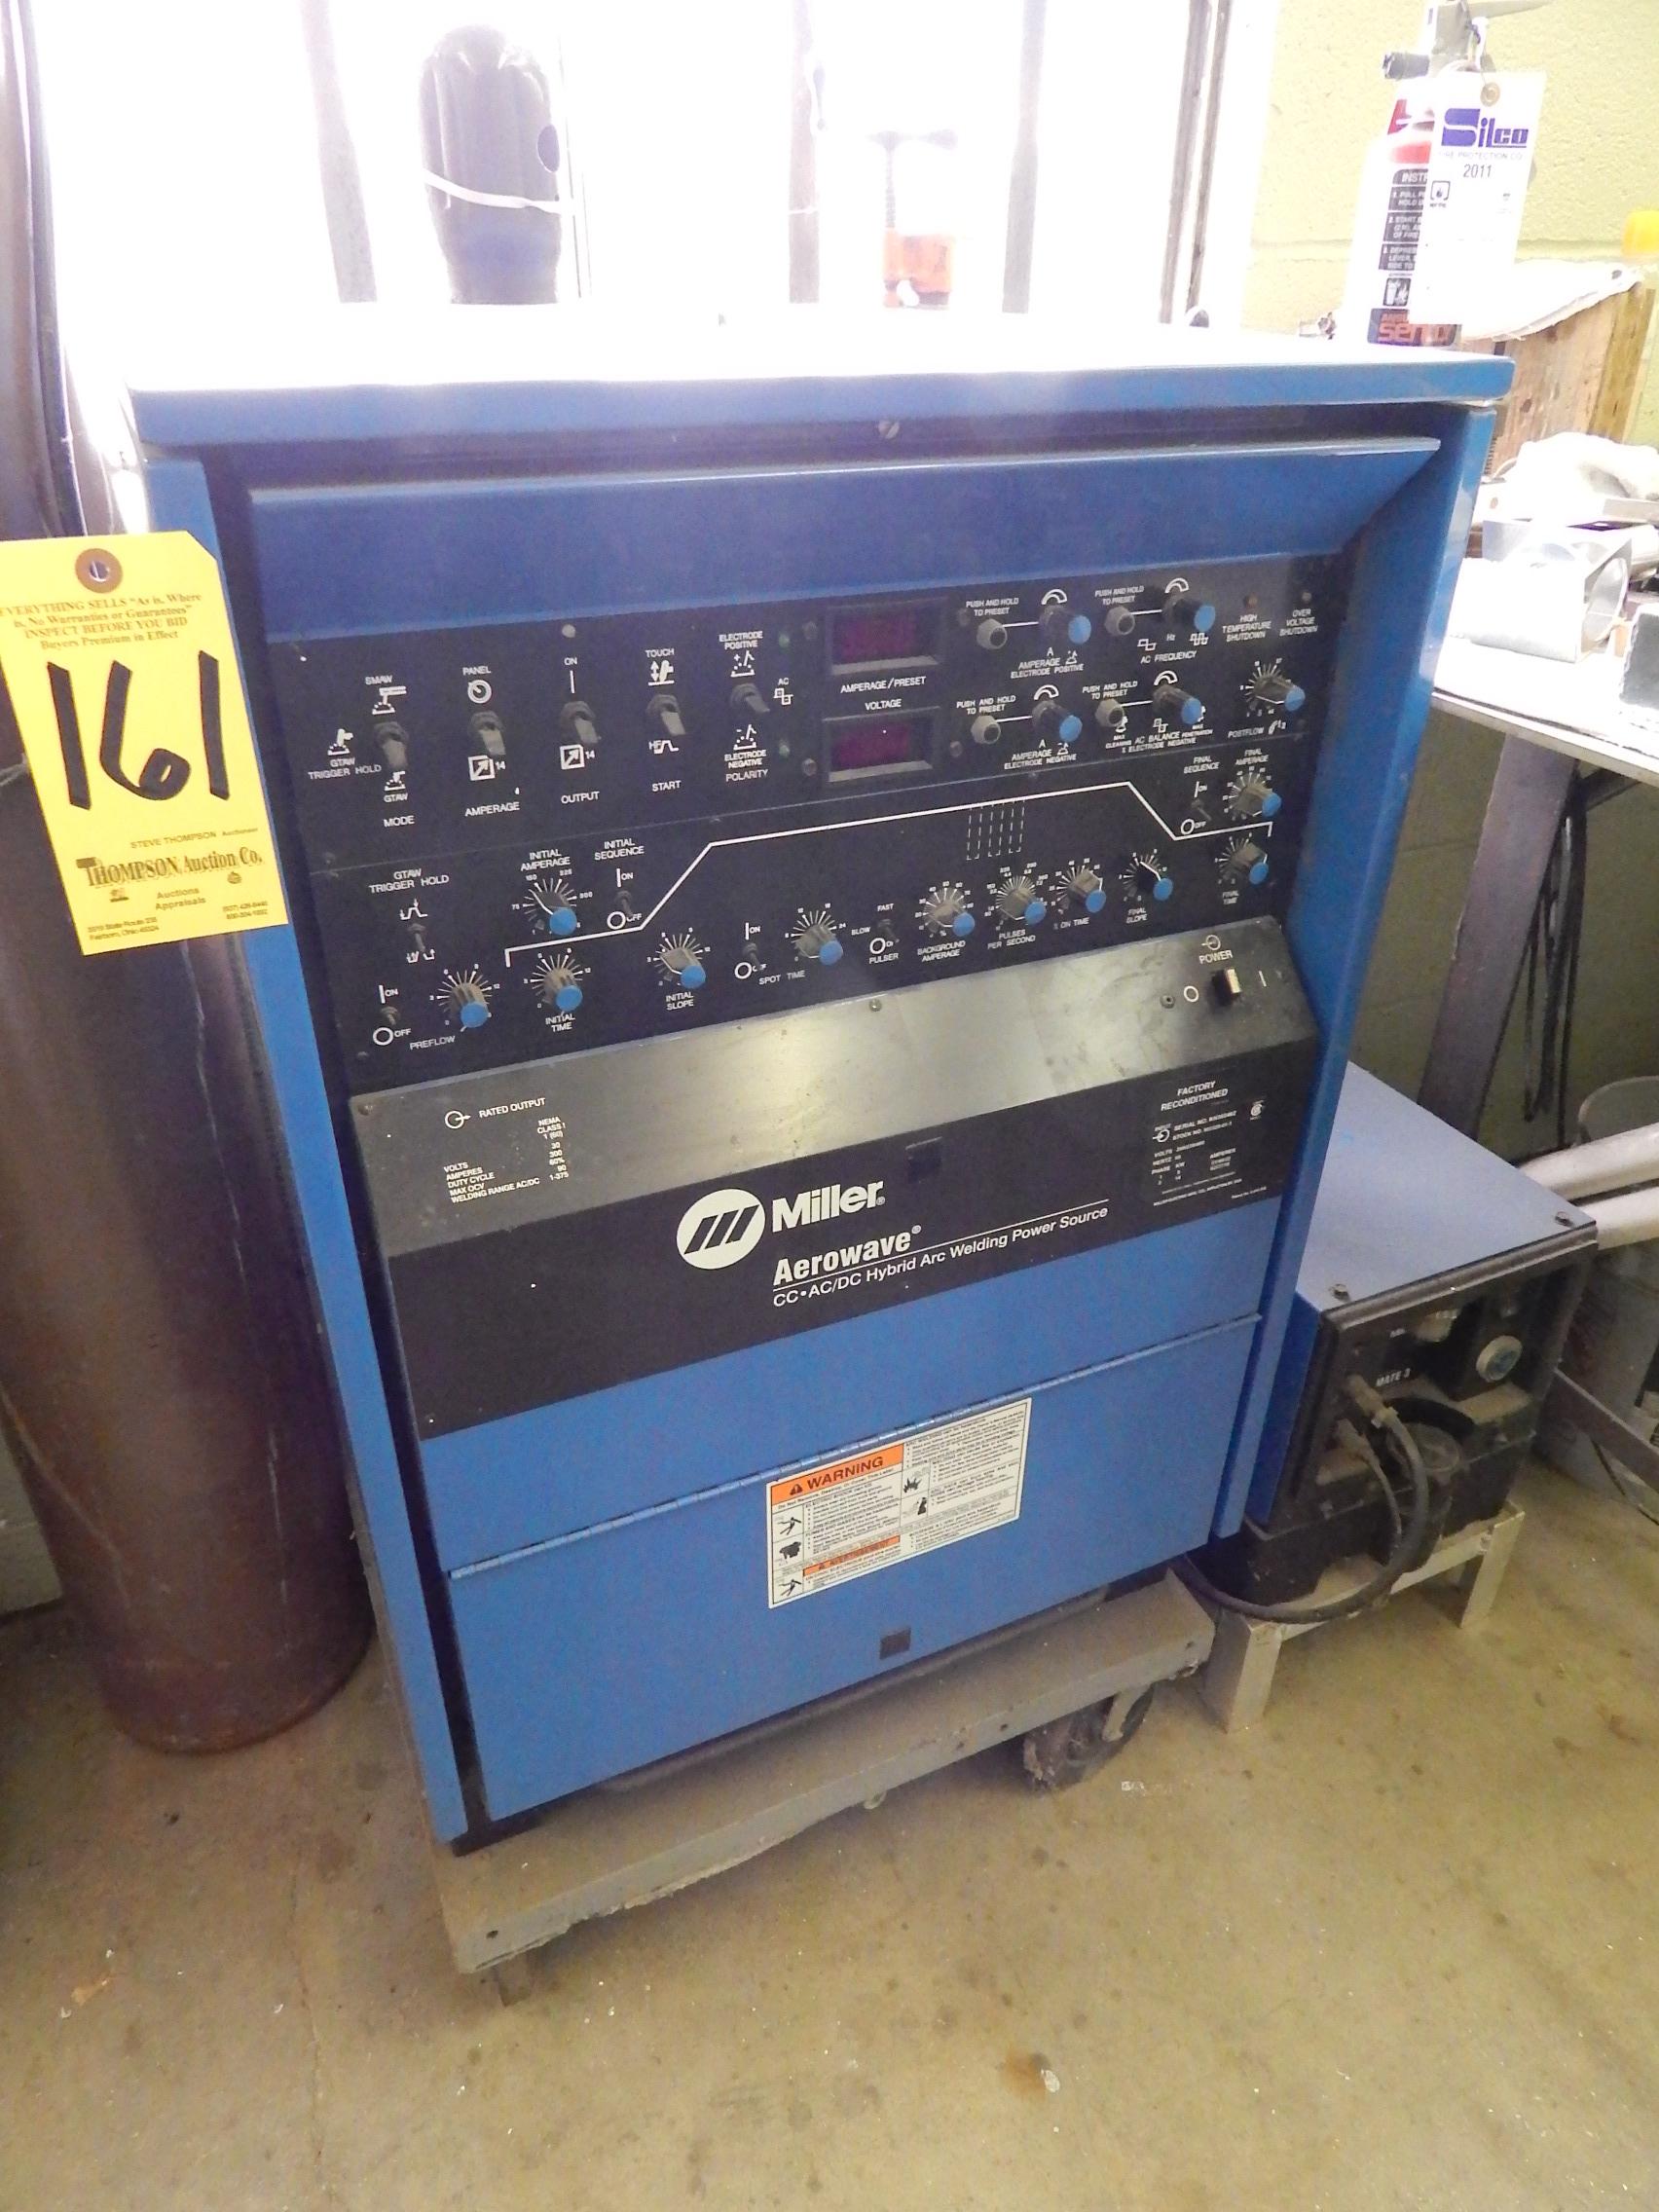 Miller Aerowave CC-AC/DC Hybrid Arc Welder, S/N KH303462